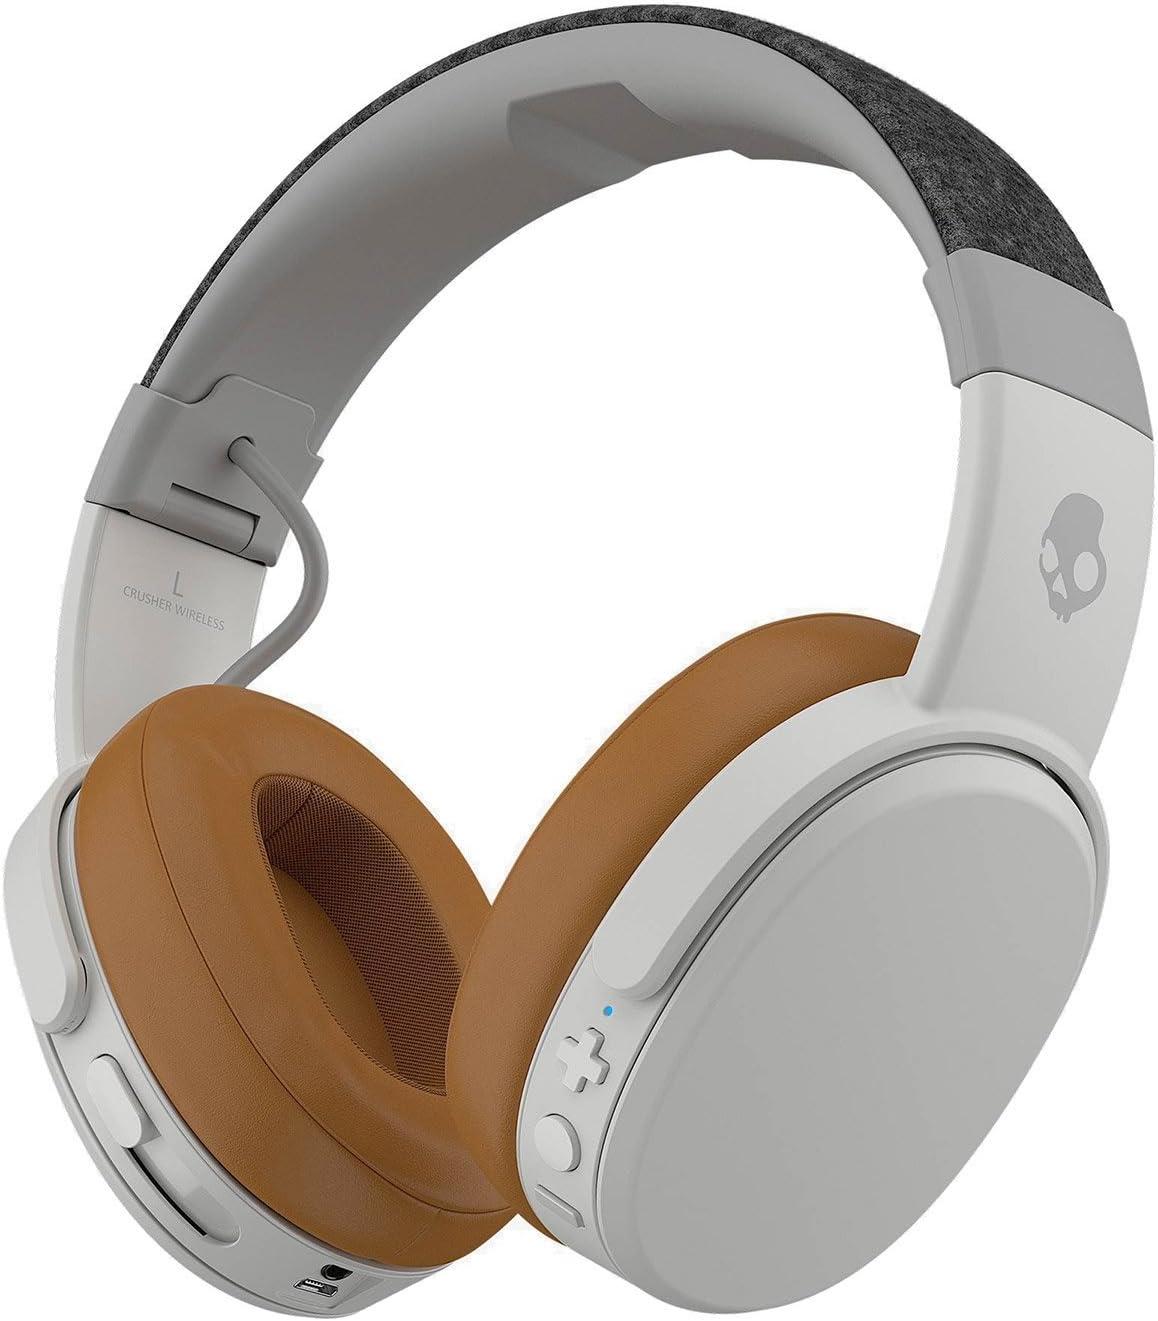 Skullcandy Crusher Wireless Over-Ear Headphone - Gray/Tan: Electronics